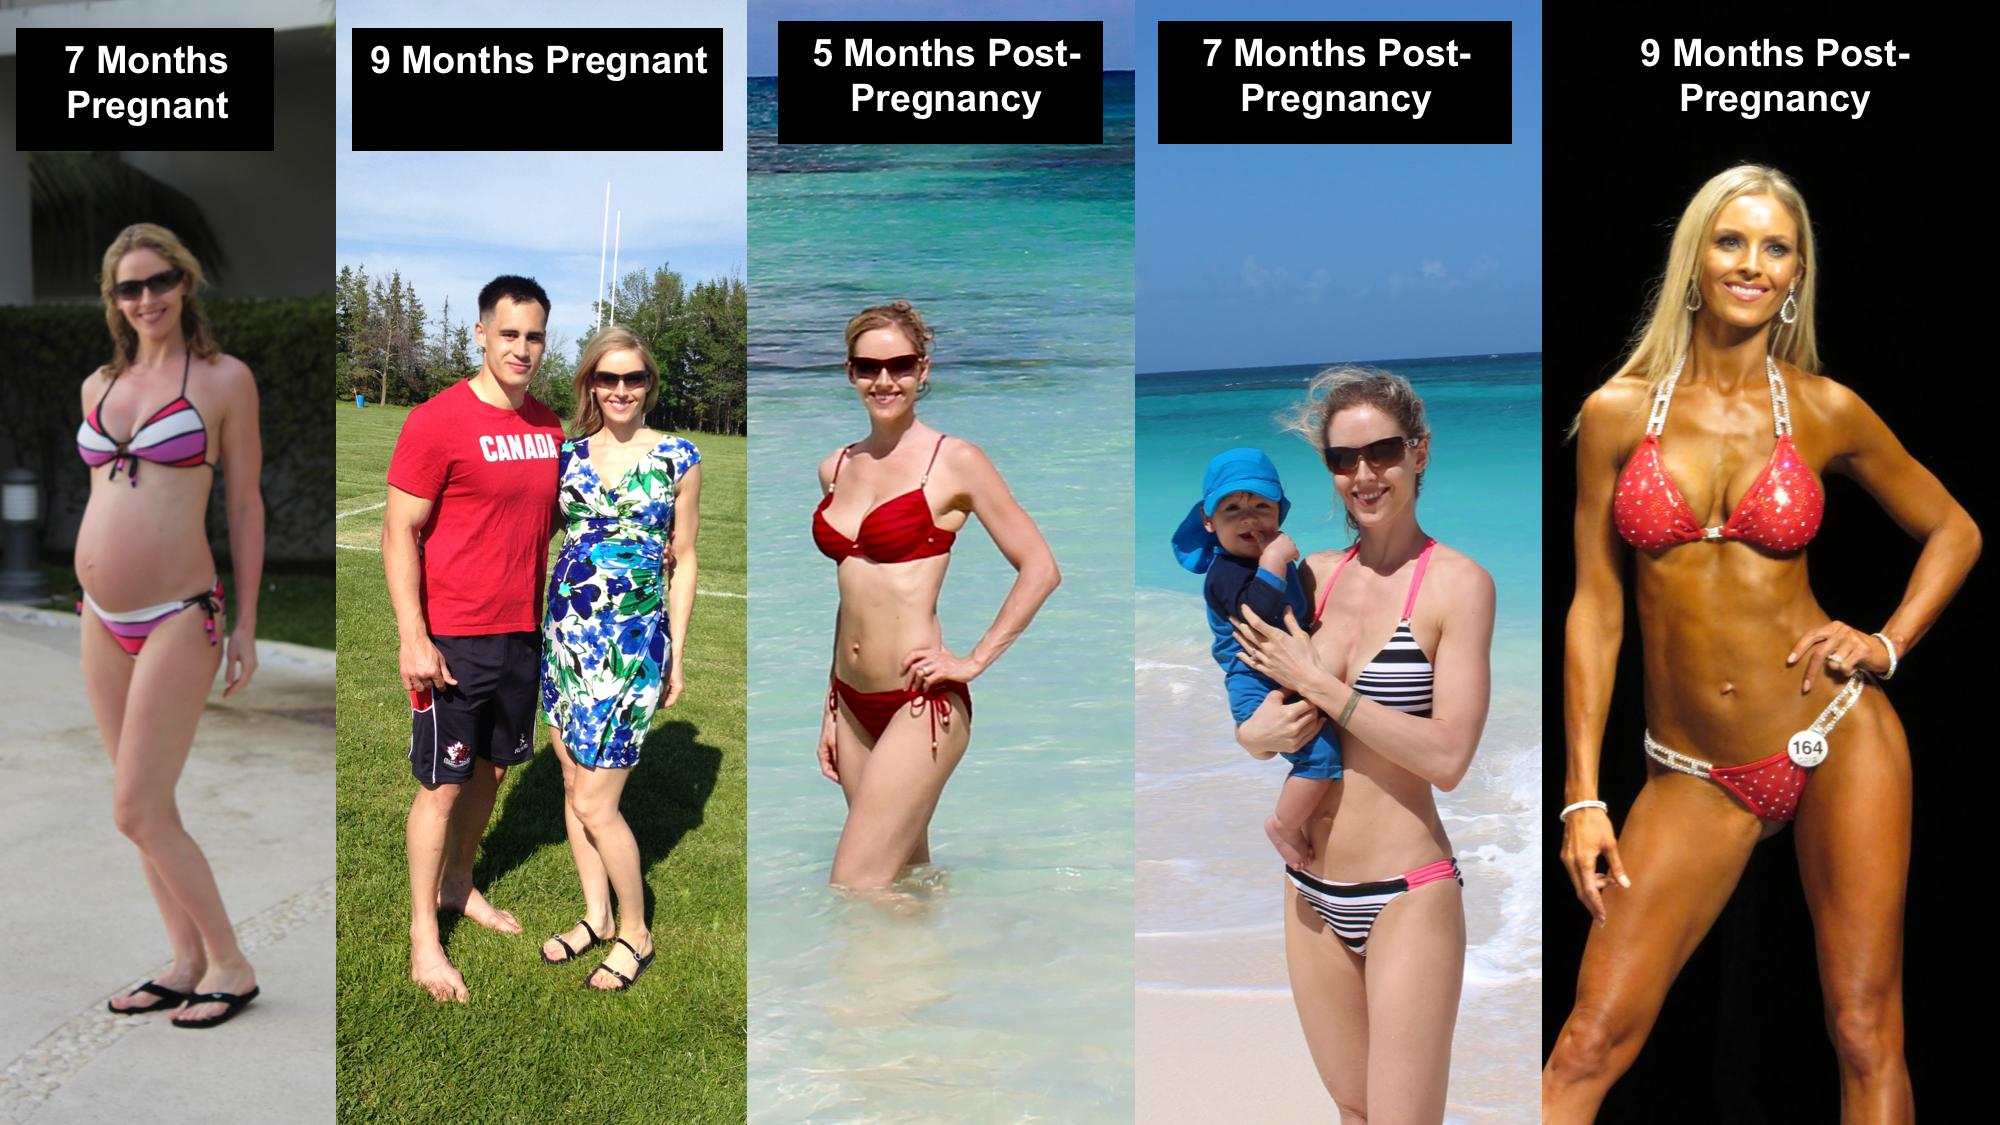 ivana-chapman-pregnancy-pictures-lean-fit-healthy